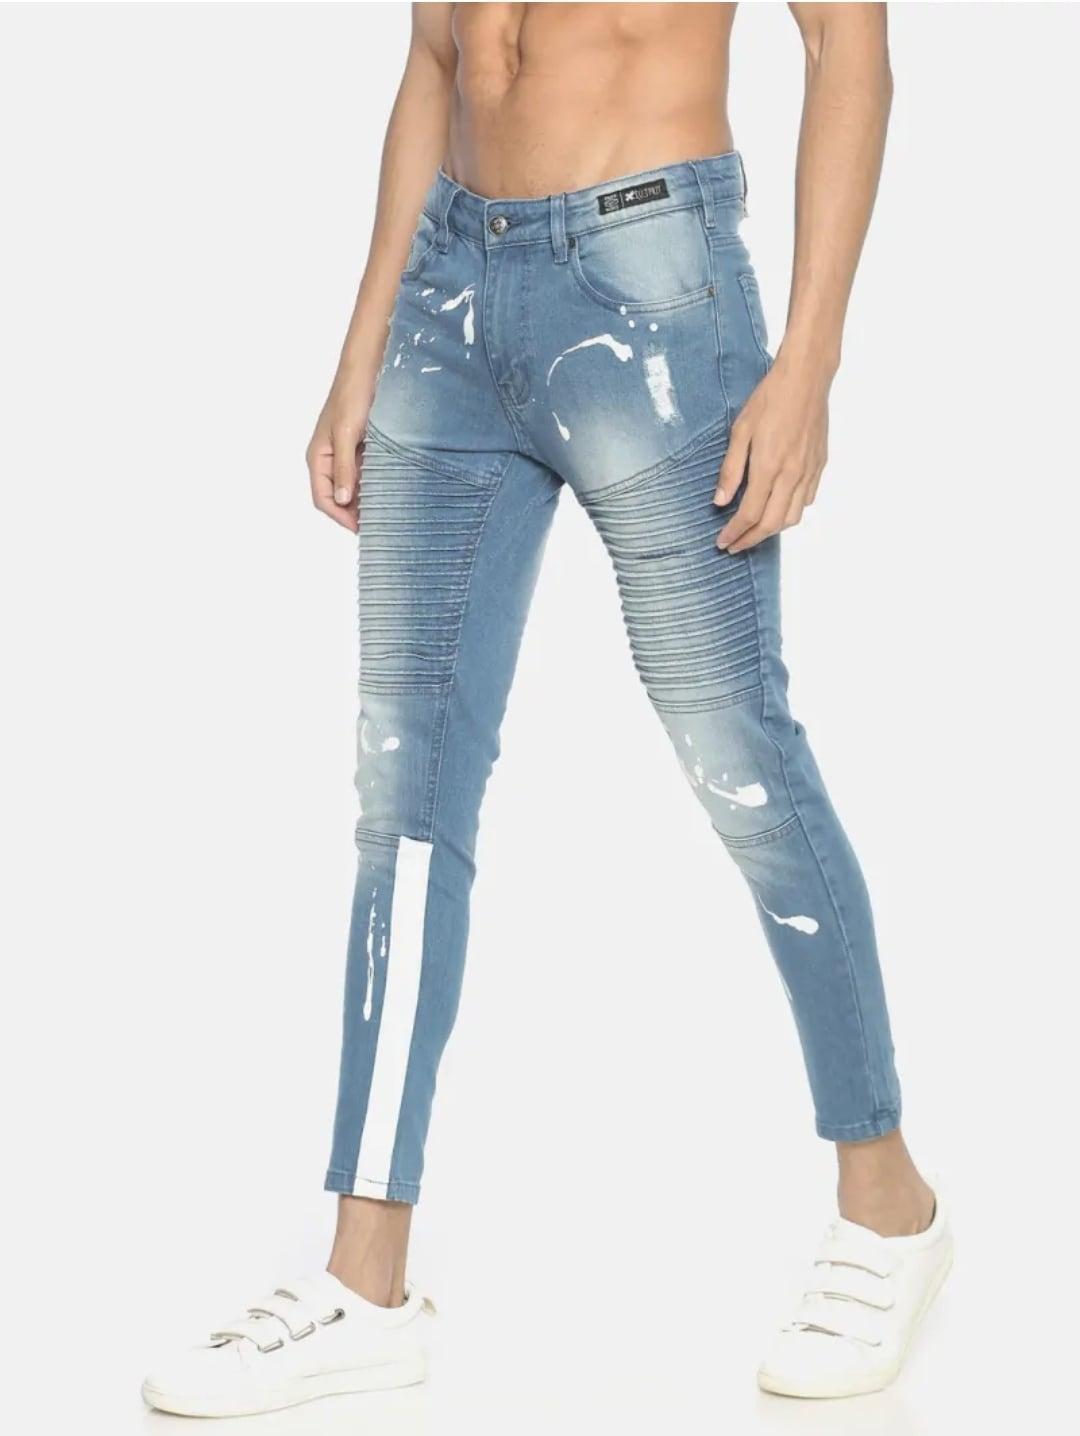 Men's Sky Blue Printed Jeans (34,Sky Blue)